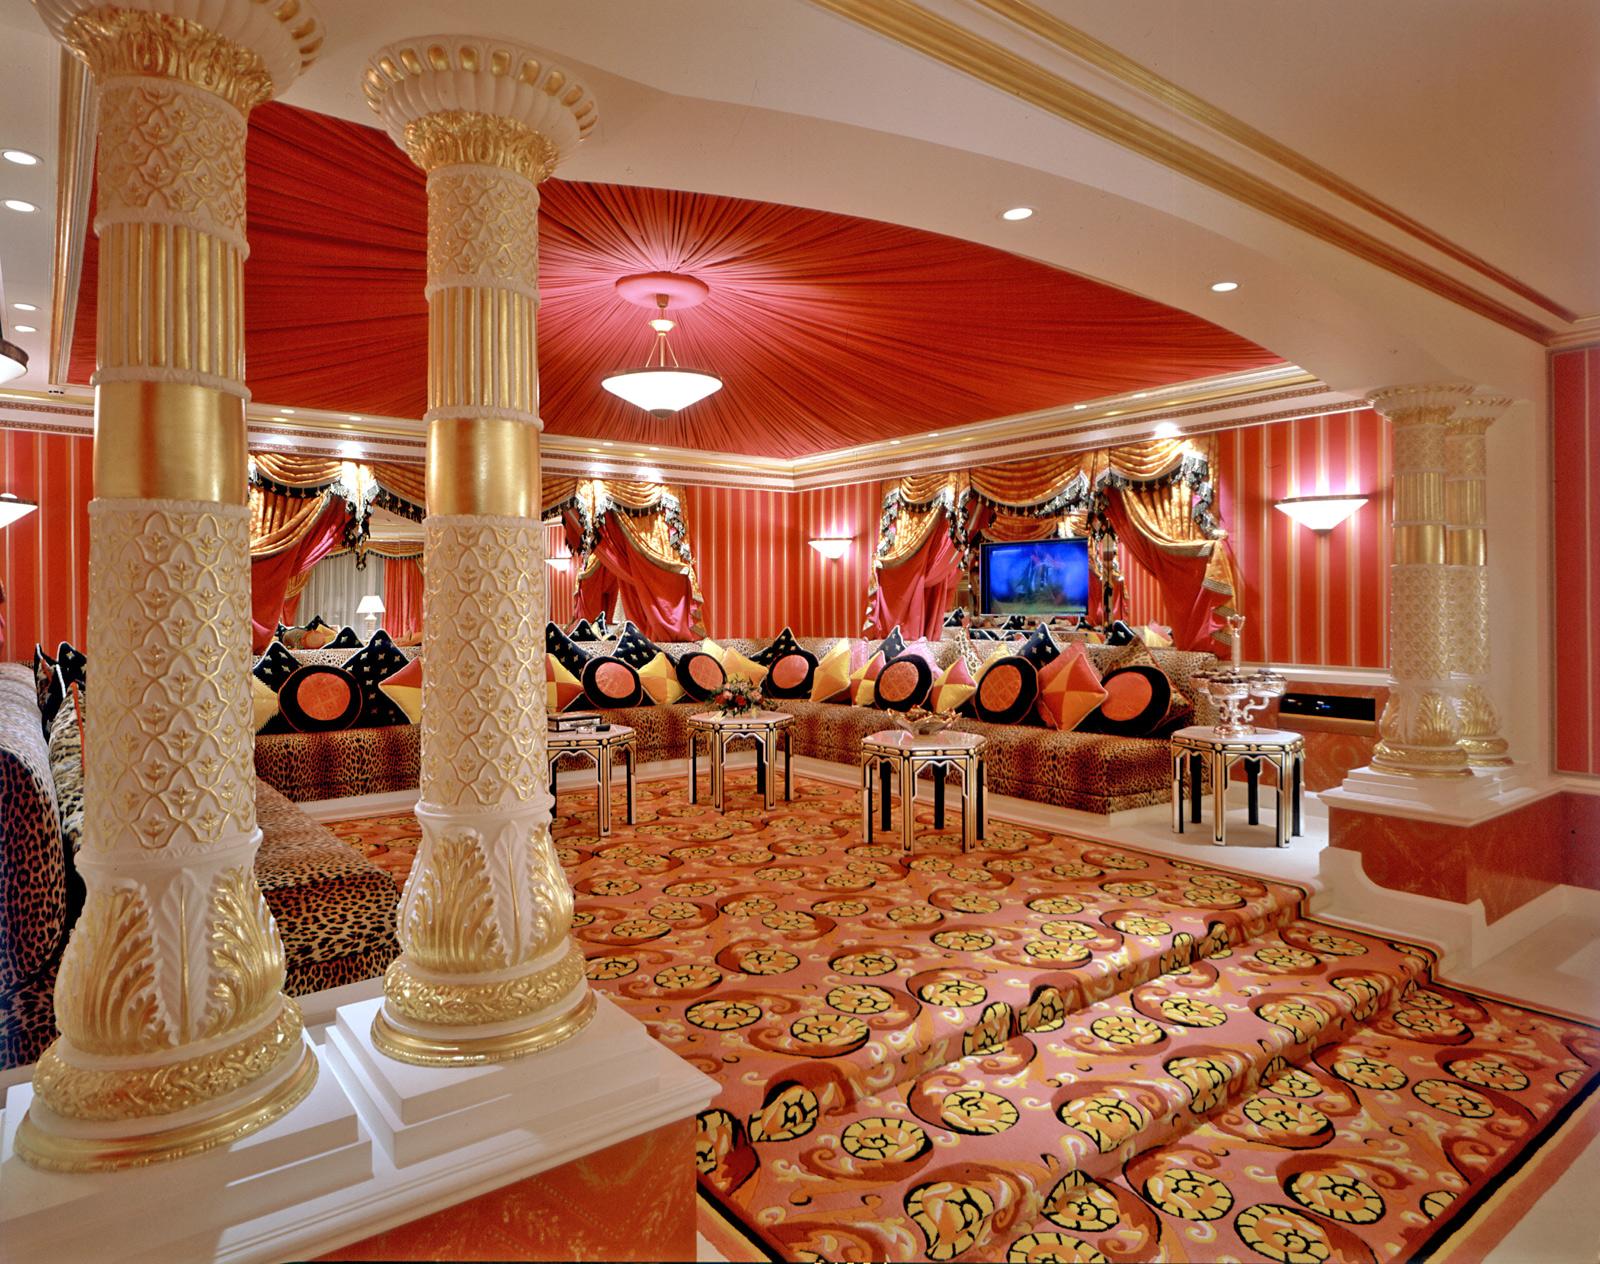 http://3.bp.blogspot.com/_T2buuNUUNTA/TThGIG_7OjI/AAAAAAAAEb0/KFr2T3Kf2iE/s1600/burj-al-arab-luxury-suite.jpg